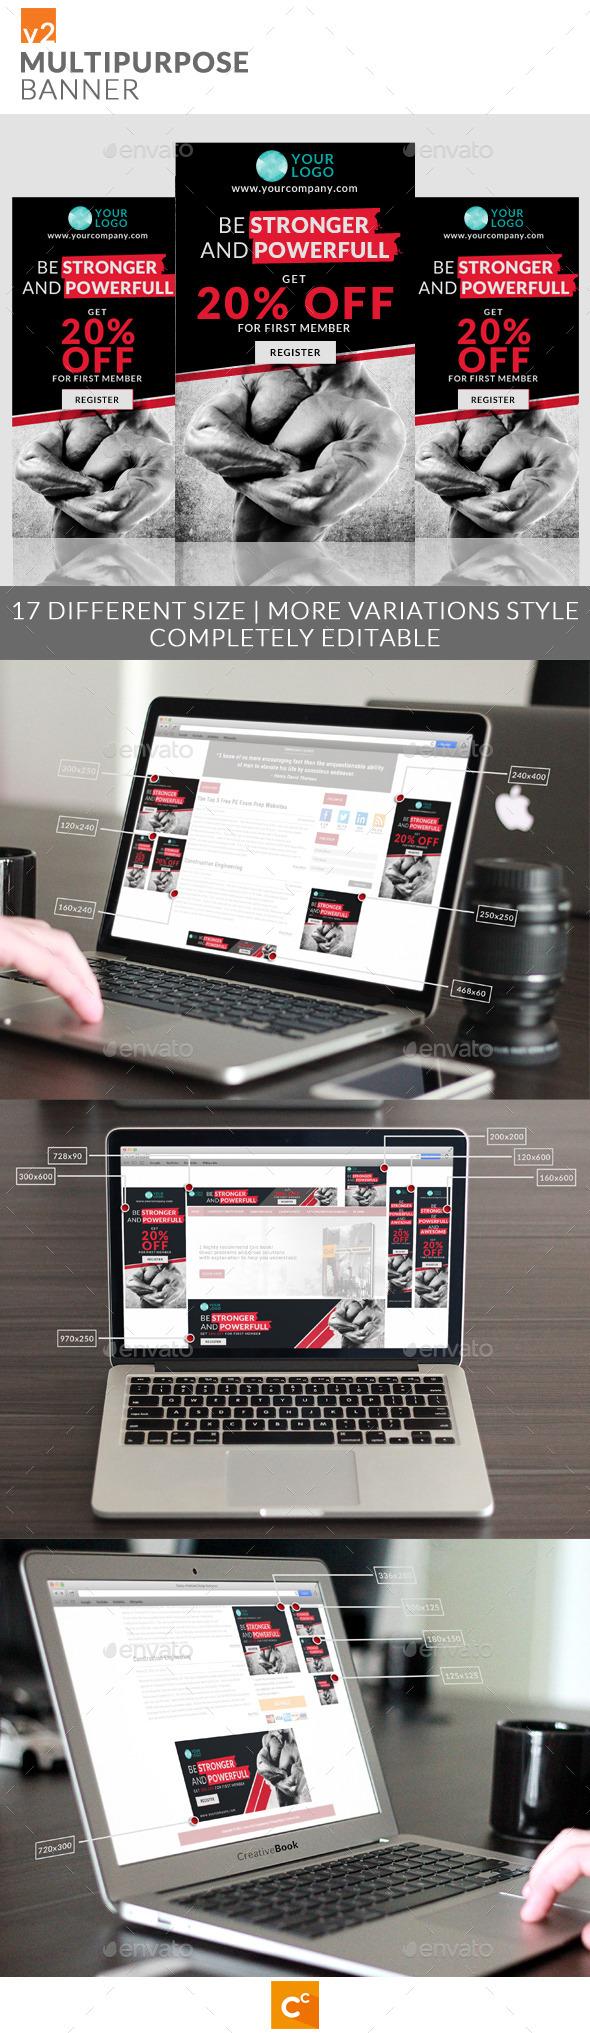 Multipurpose Banner Ads v2 - Banners & Ads Web Elements